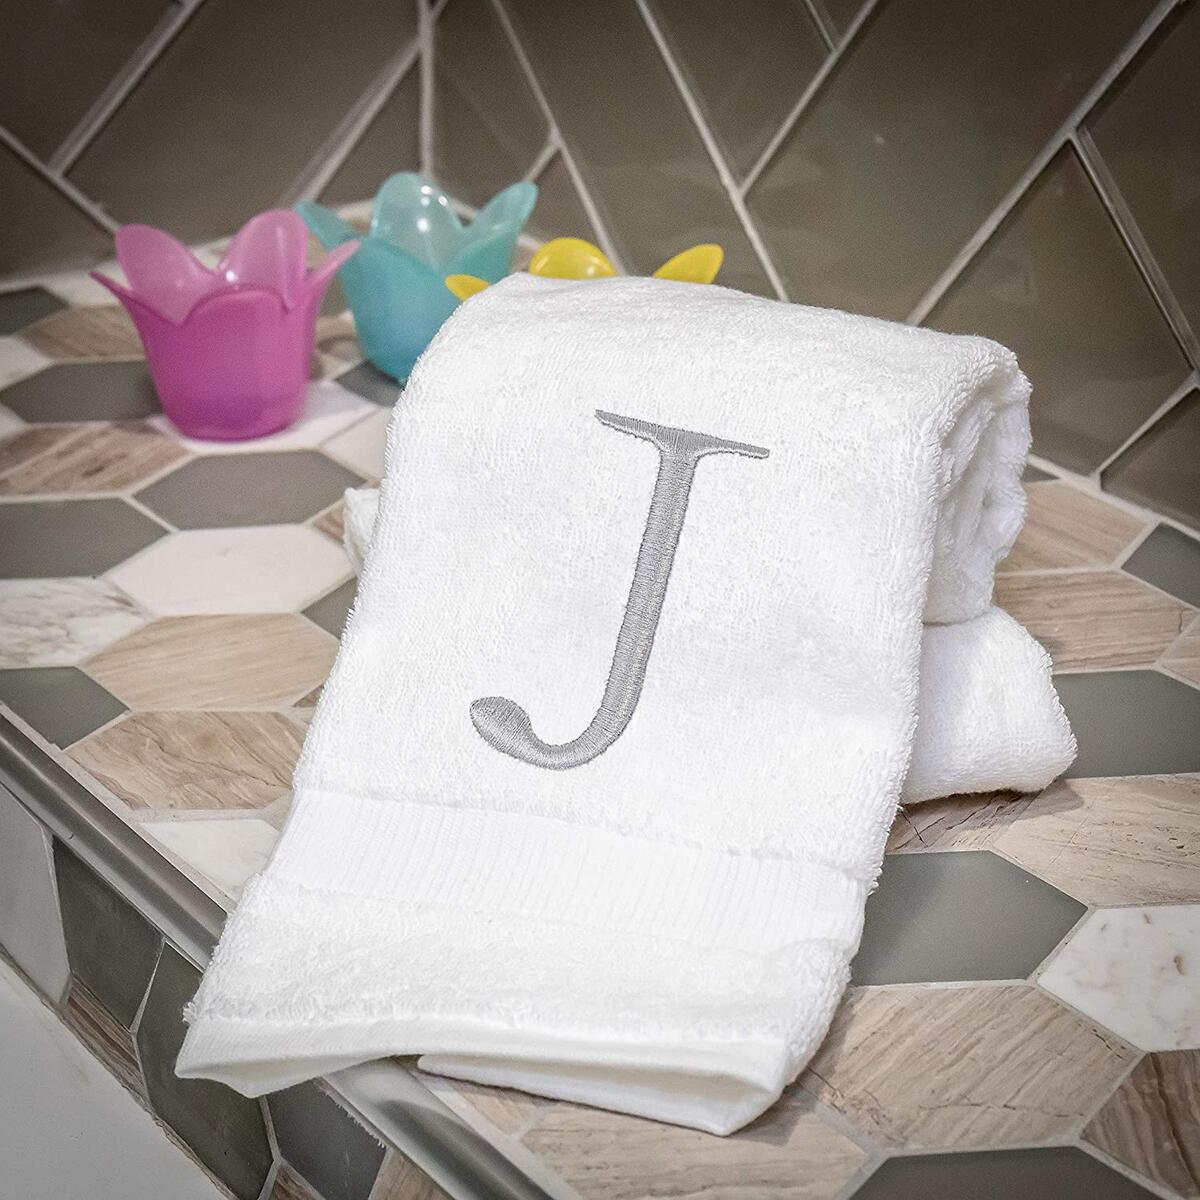 Organic Monogrammed Hand Towel for Bathroom Set of 2 - Letter J